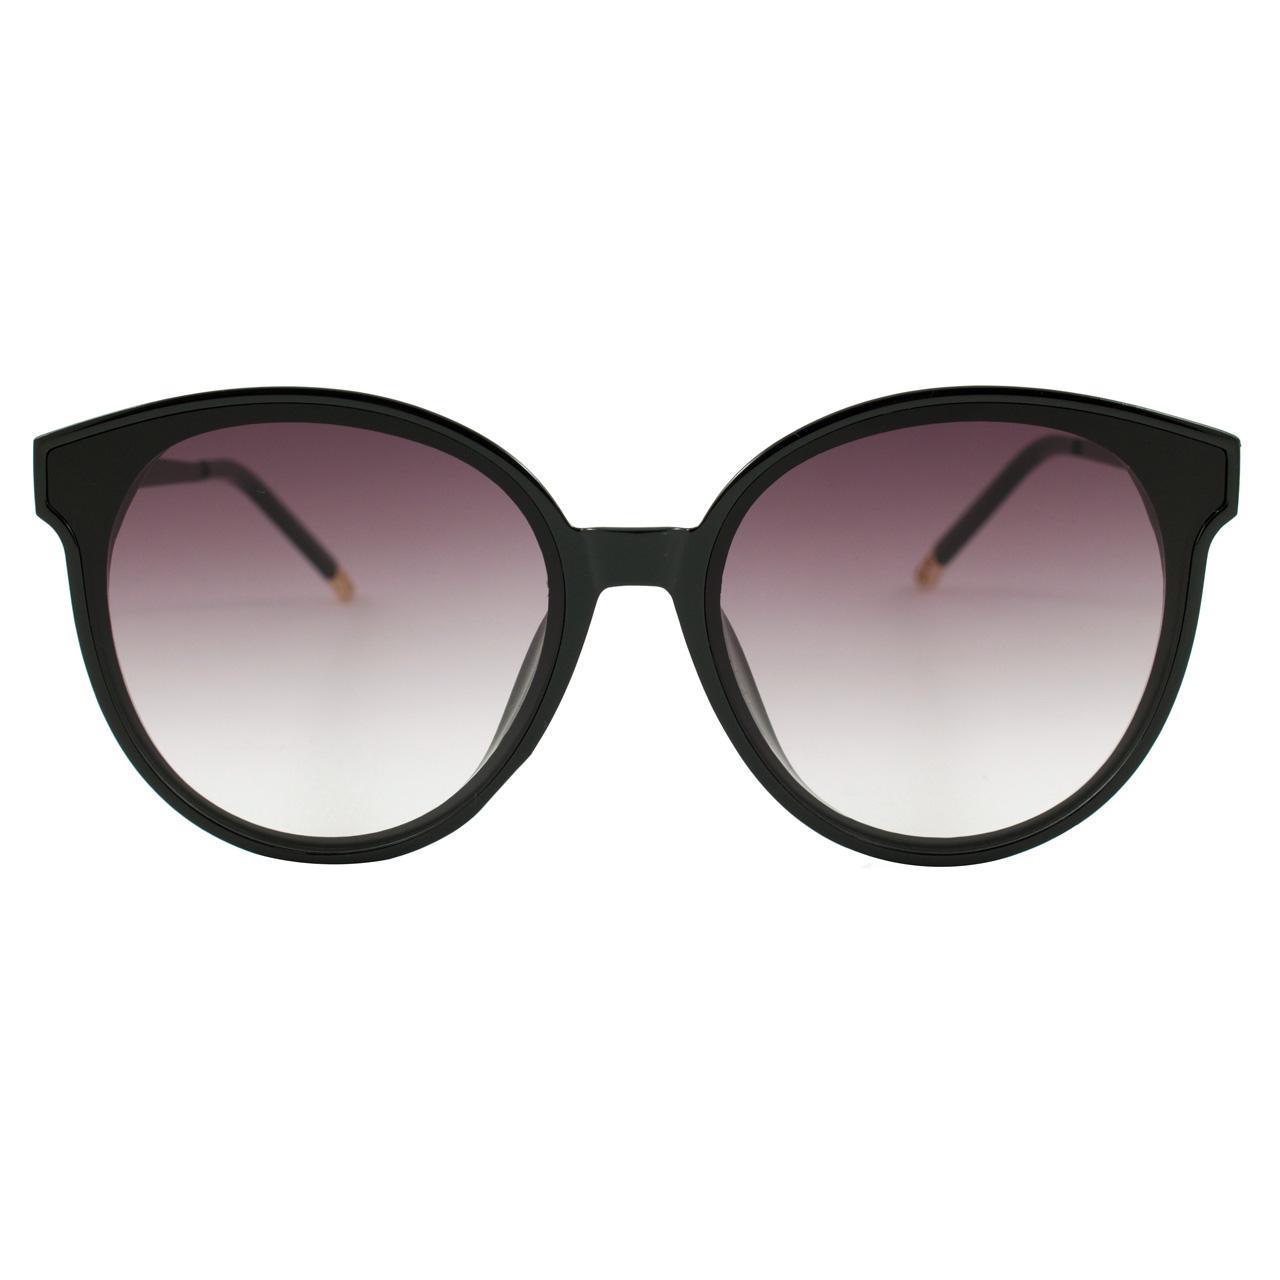 عینک آفتابی ویلی بولو مدل Big Sharp Black Cat Eye